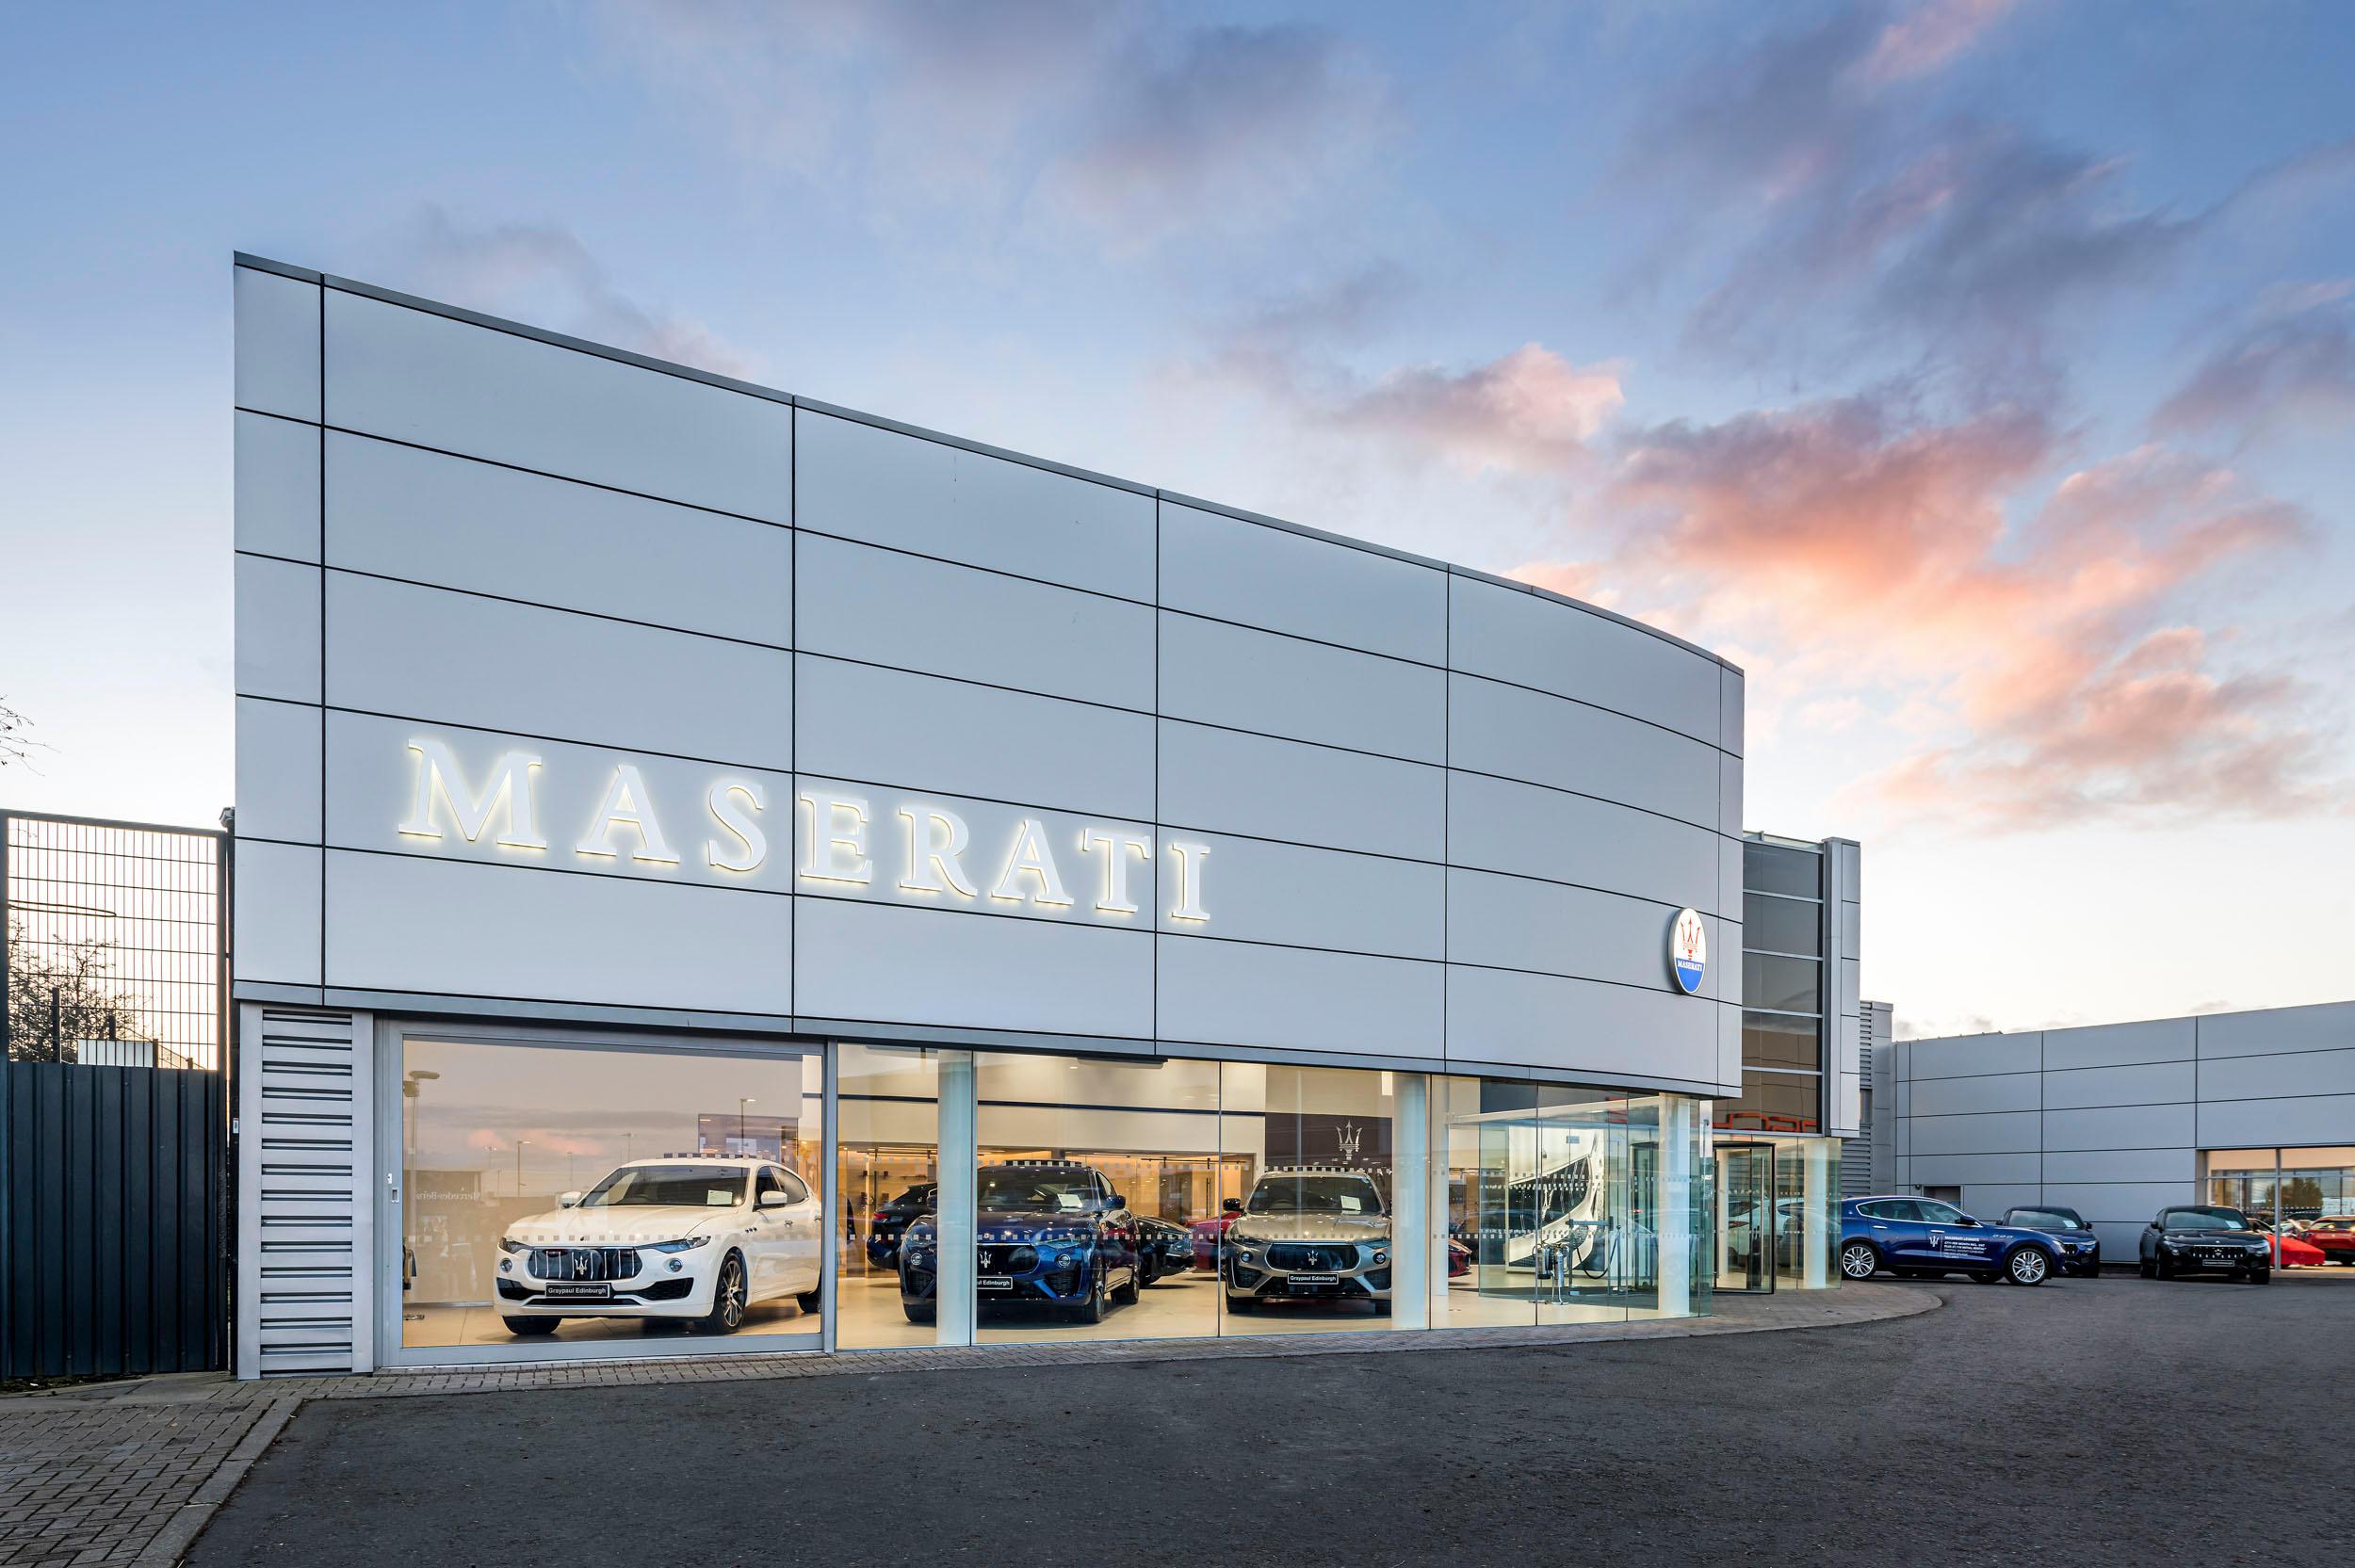 Graypaul Maserati Edinburgh Midlothain 01314 755000